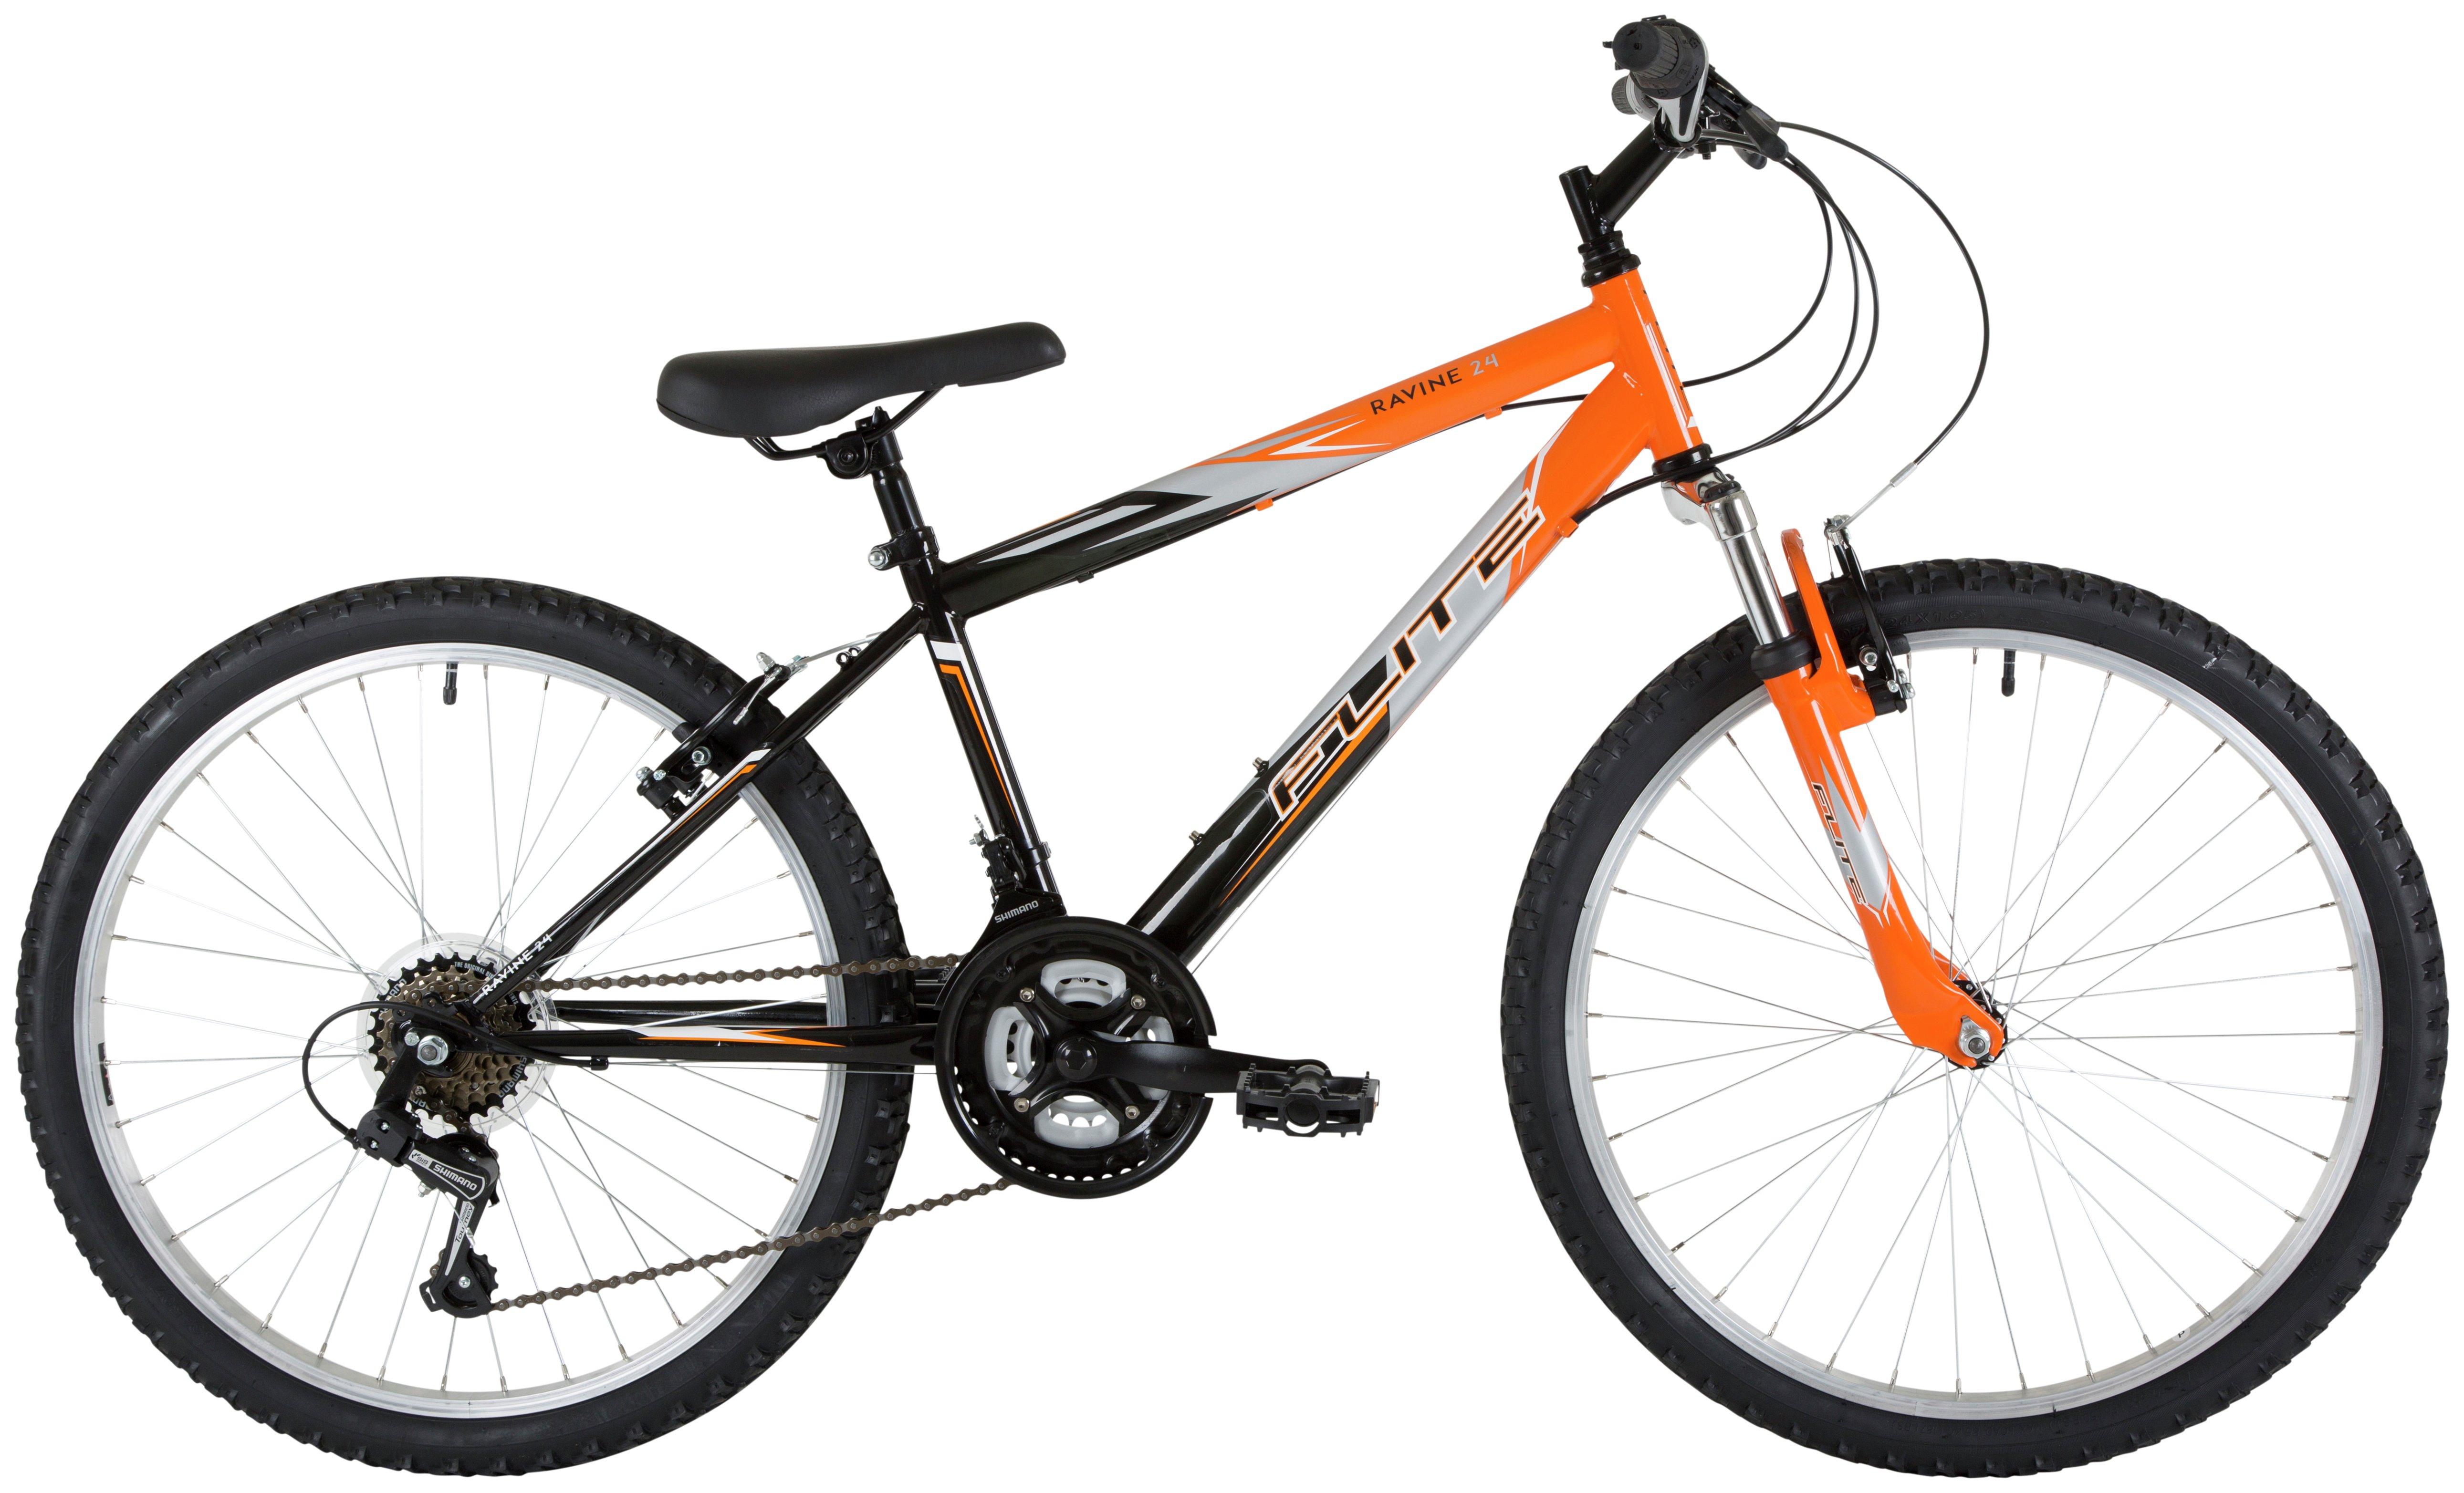 Flite Ravine 24 Inch Kids Bike